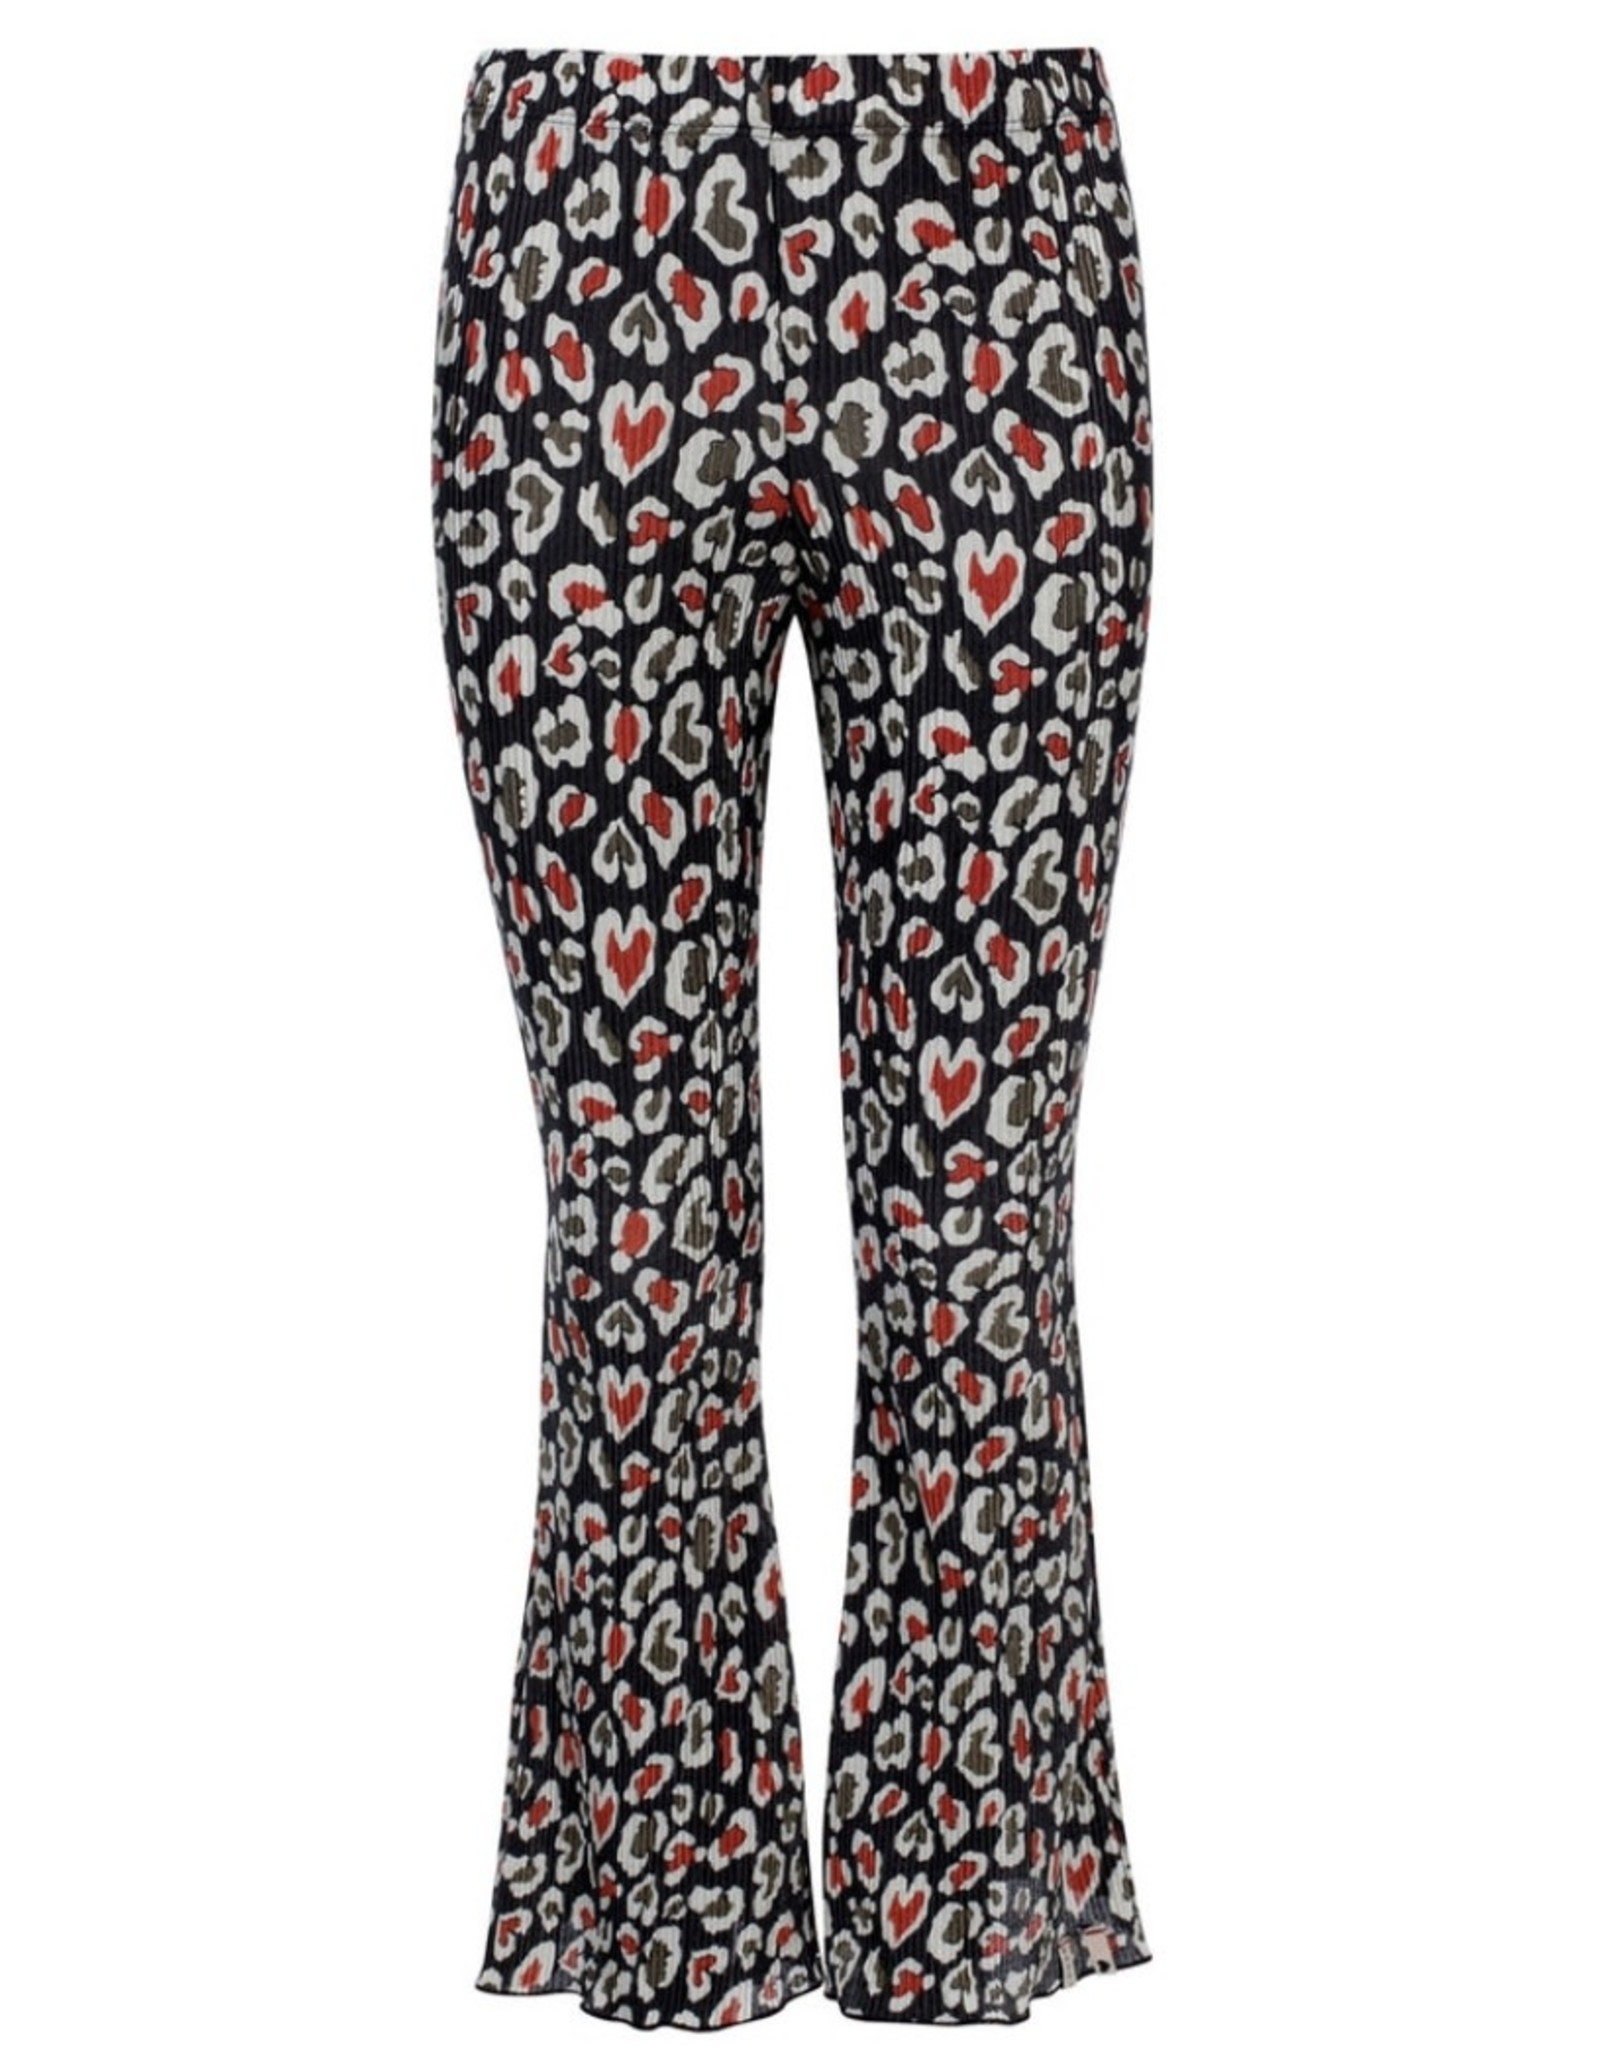 looxs 2111-5615 Flare Pants